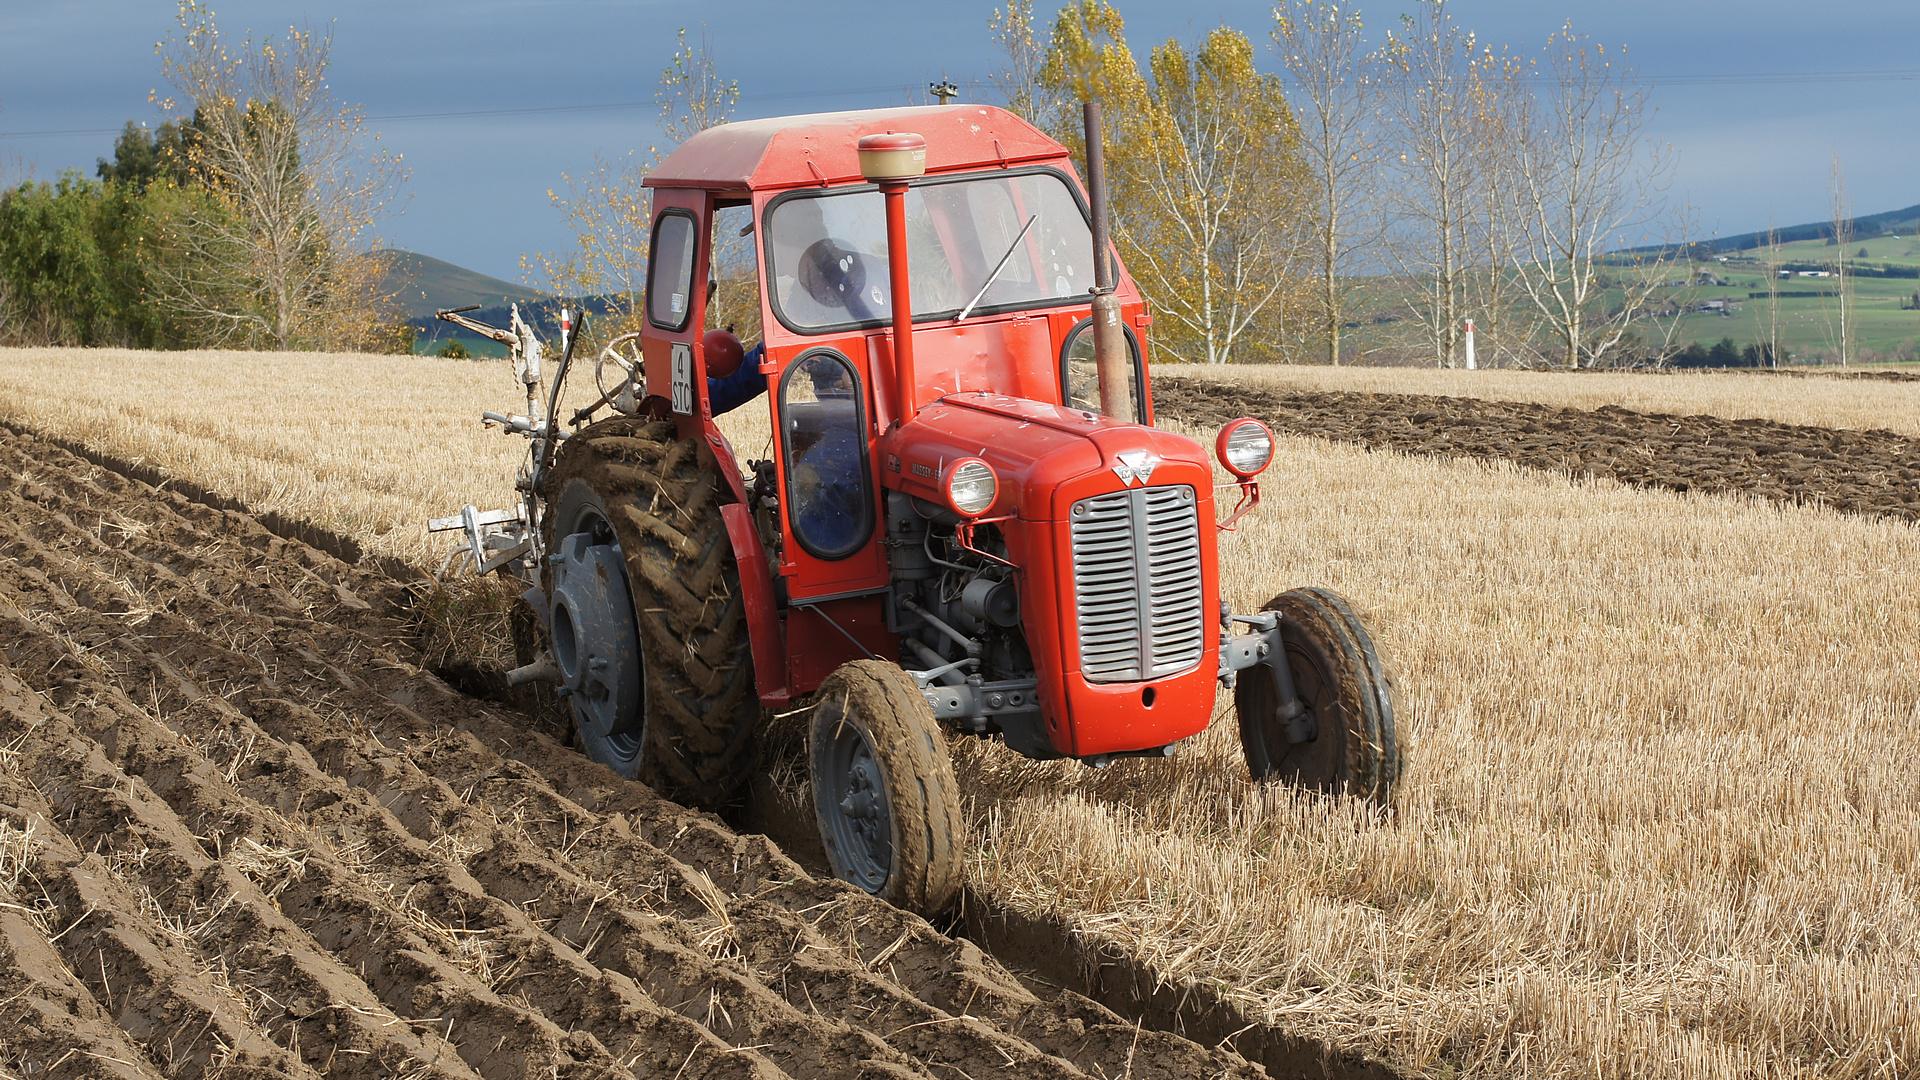 1961 Massey Ferguson 35 Diesel : Massey ferguson tractor a photo on flickriver